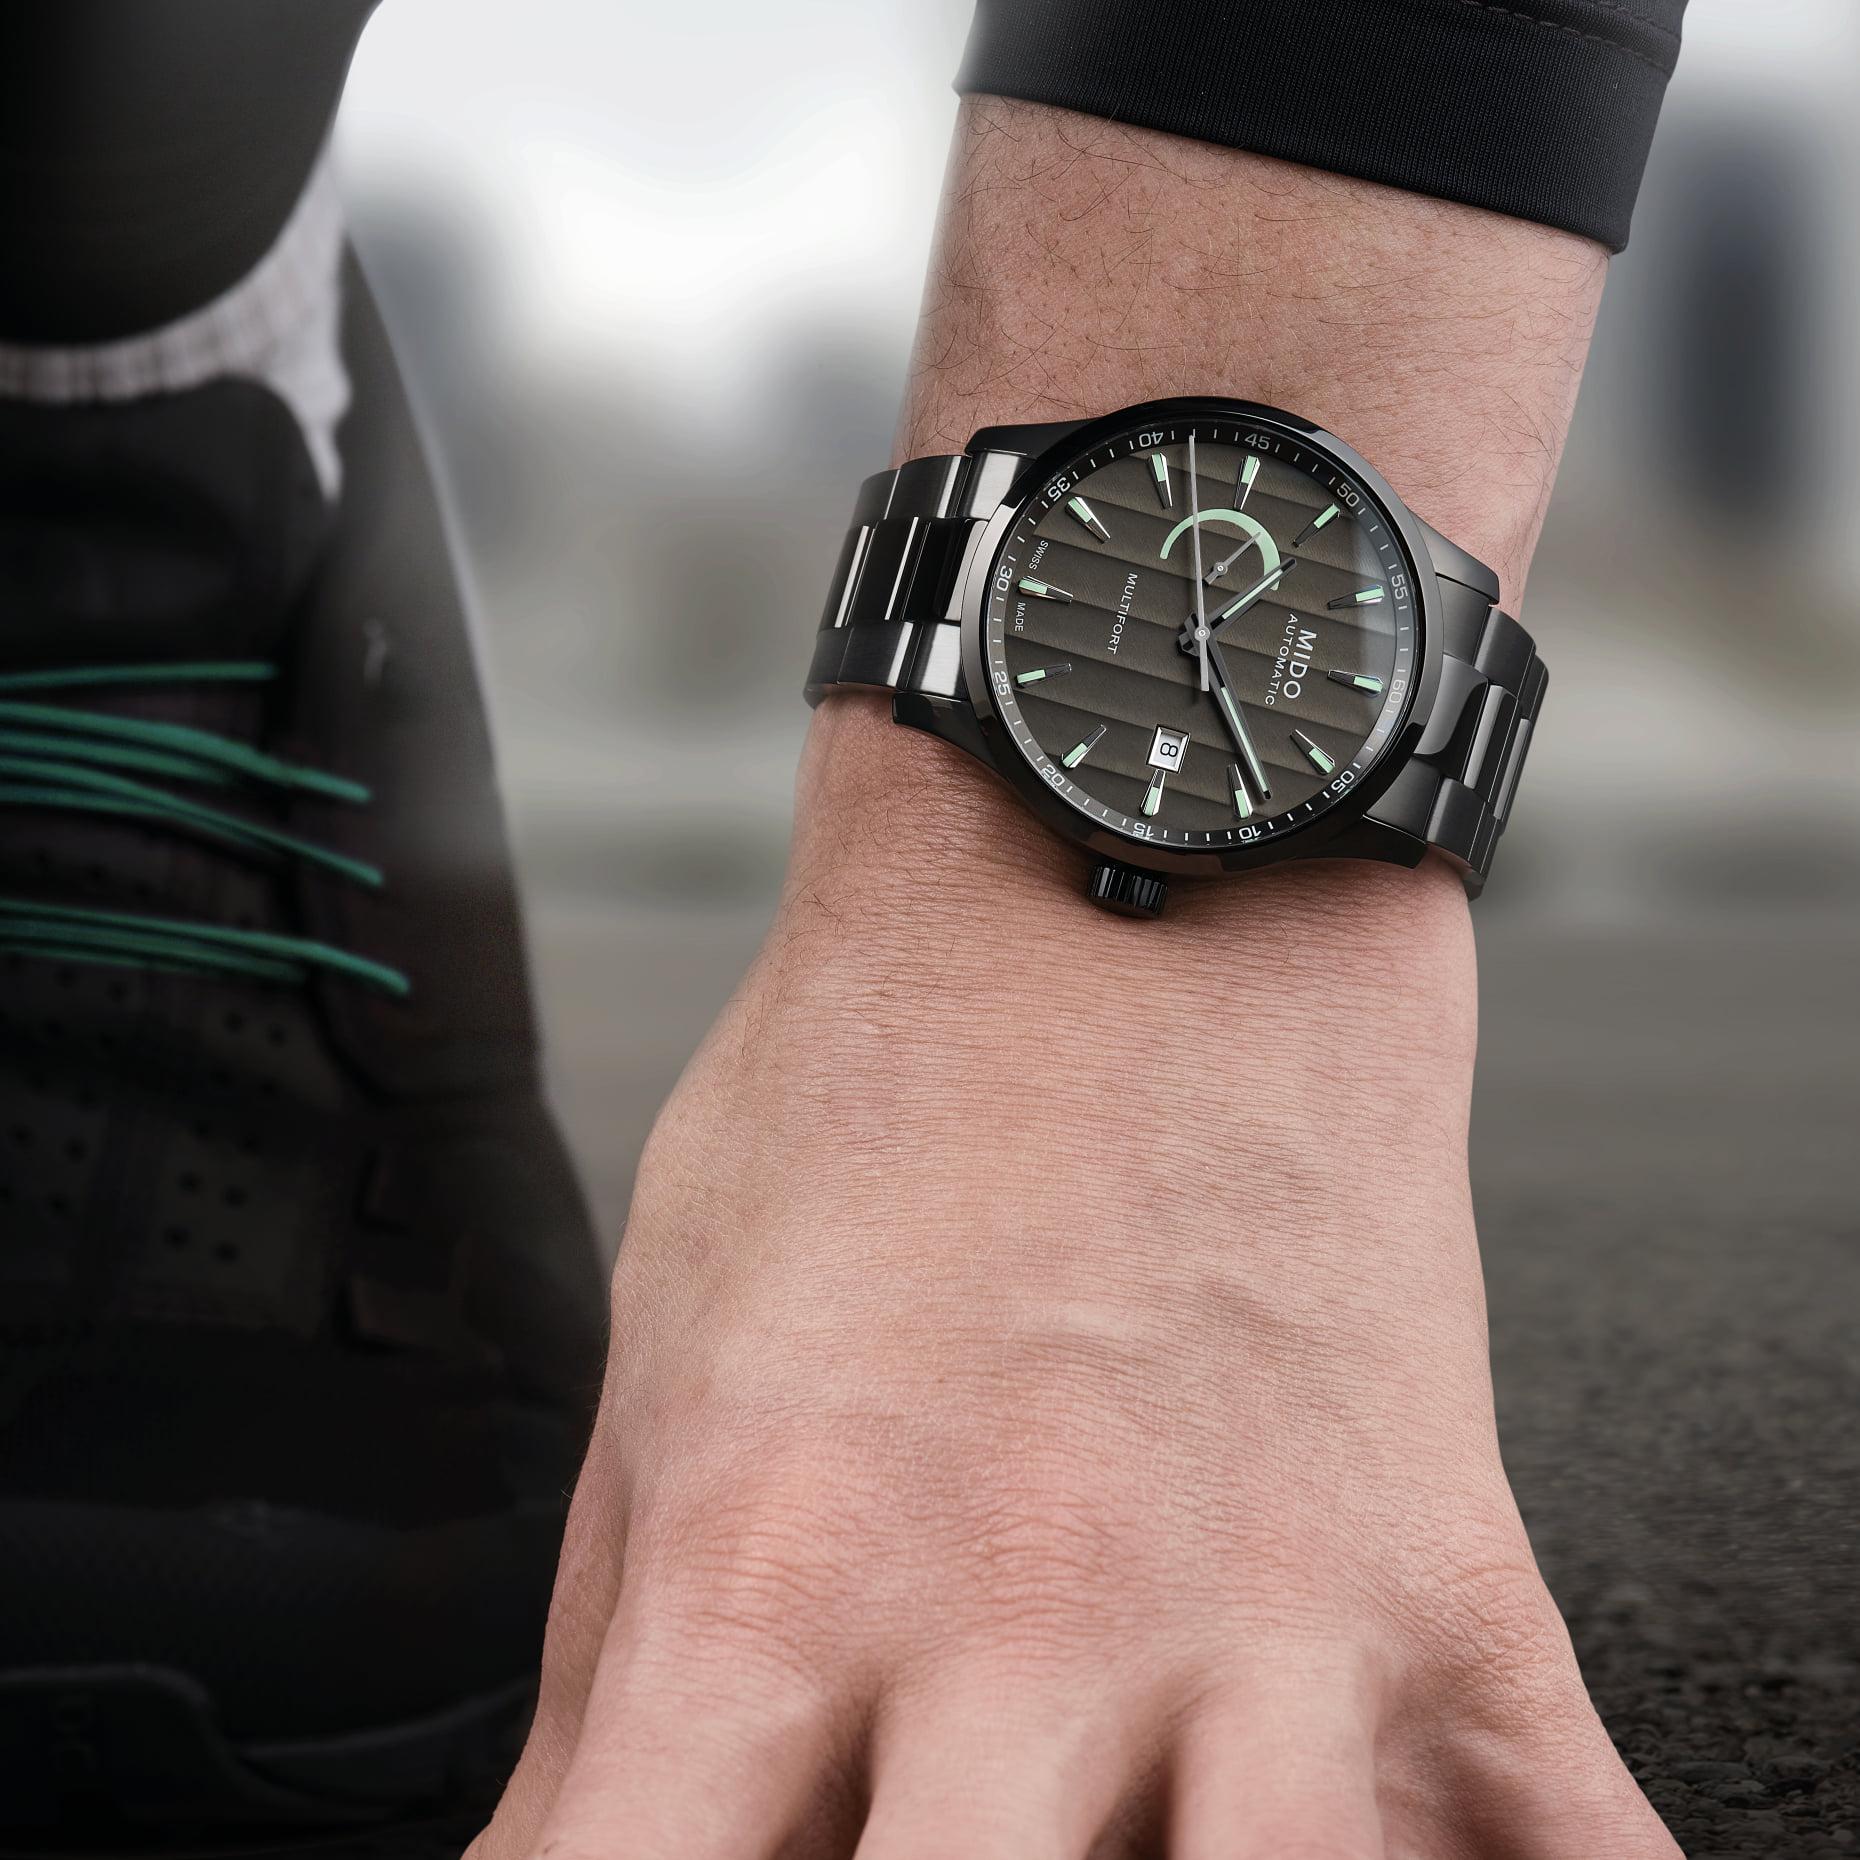 reglas para vestir un reloj